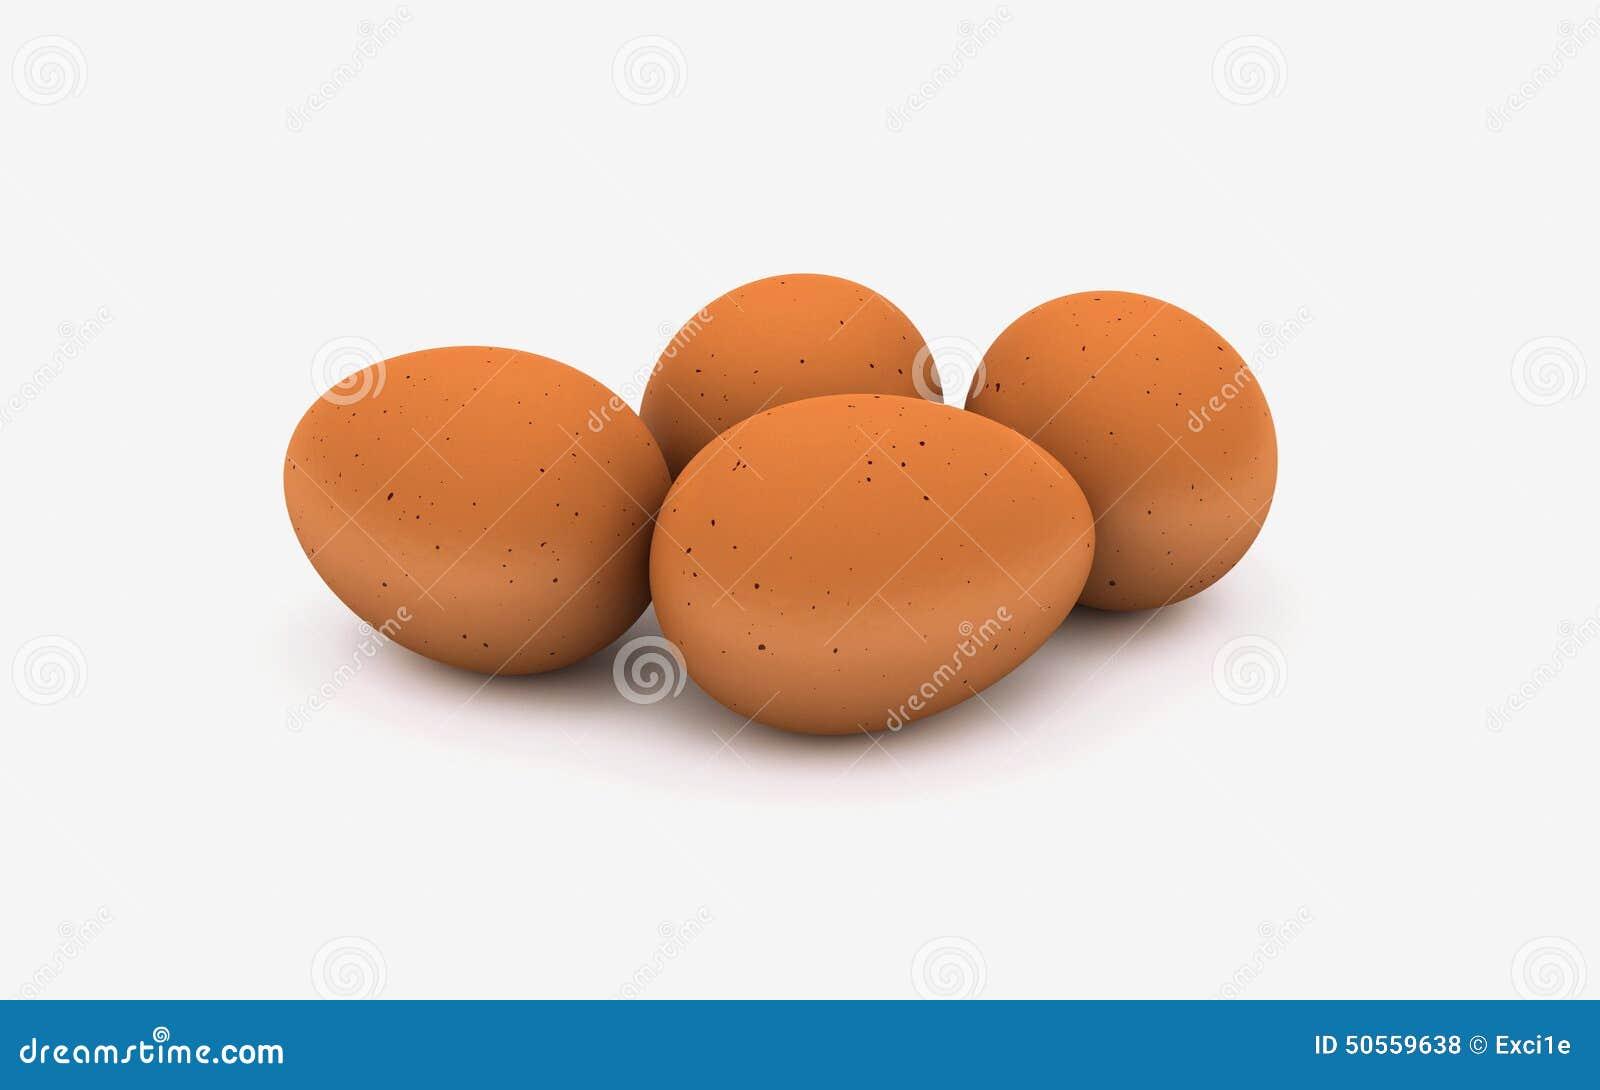 3d illustration of 4 eggs on a white background stock illustration